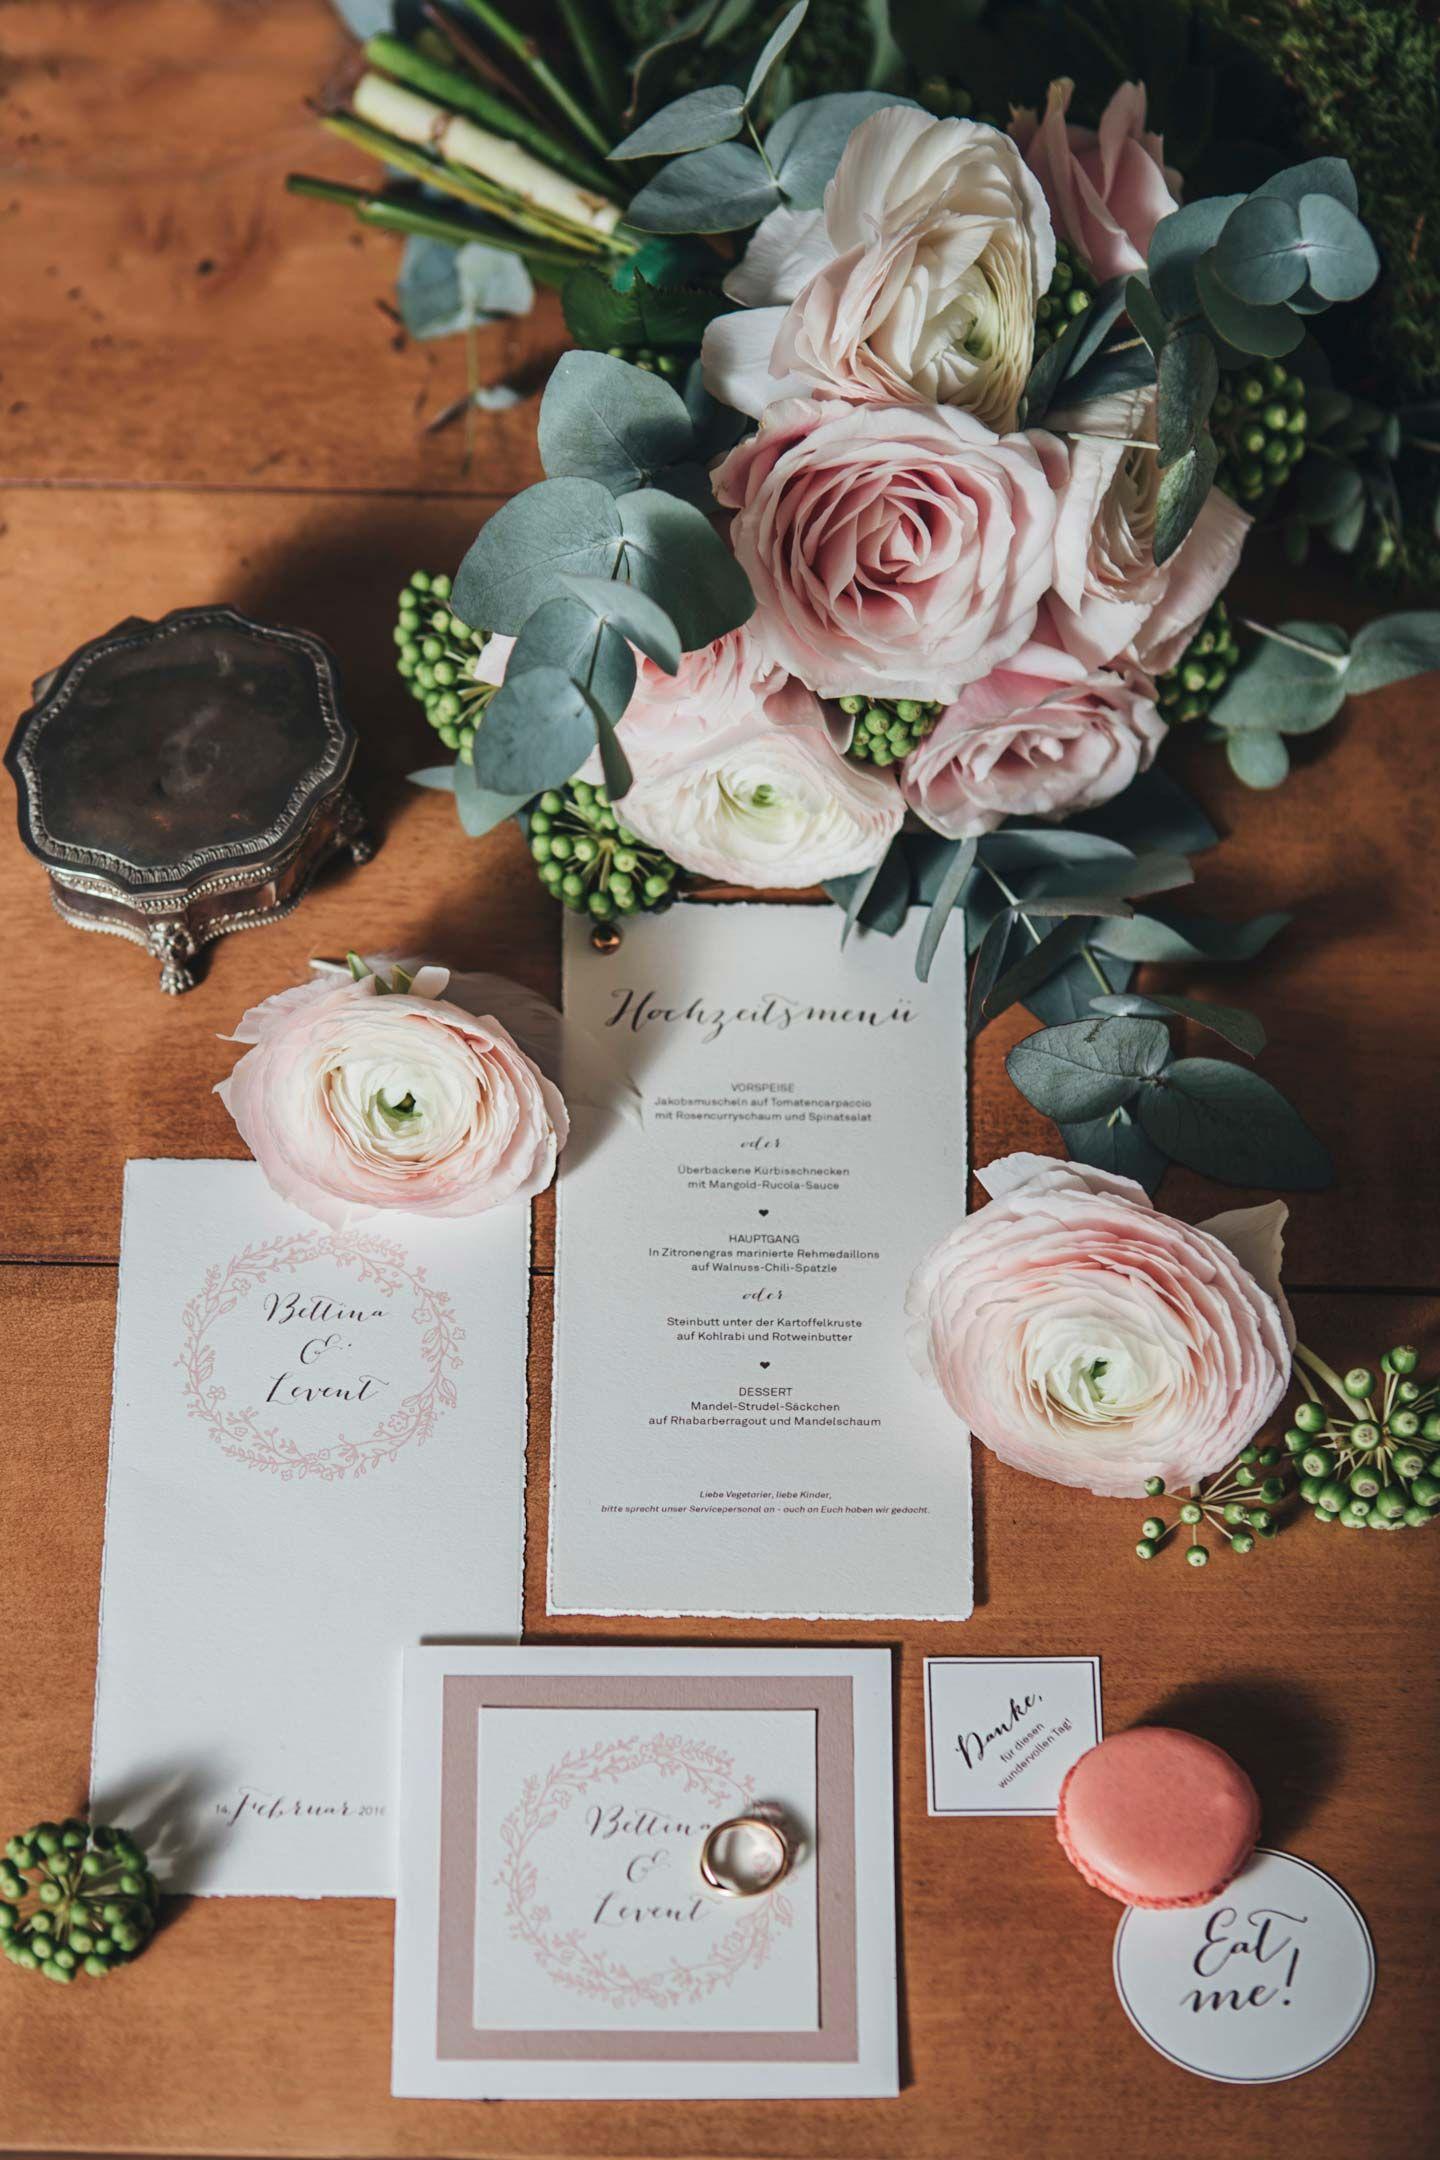 Glamouröse Nostalgie mit rosa Romantik | Rosa, Romantik